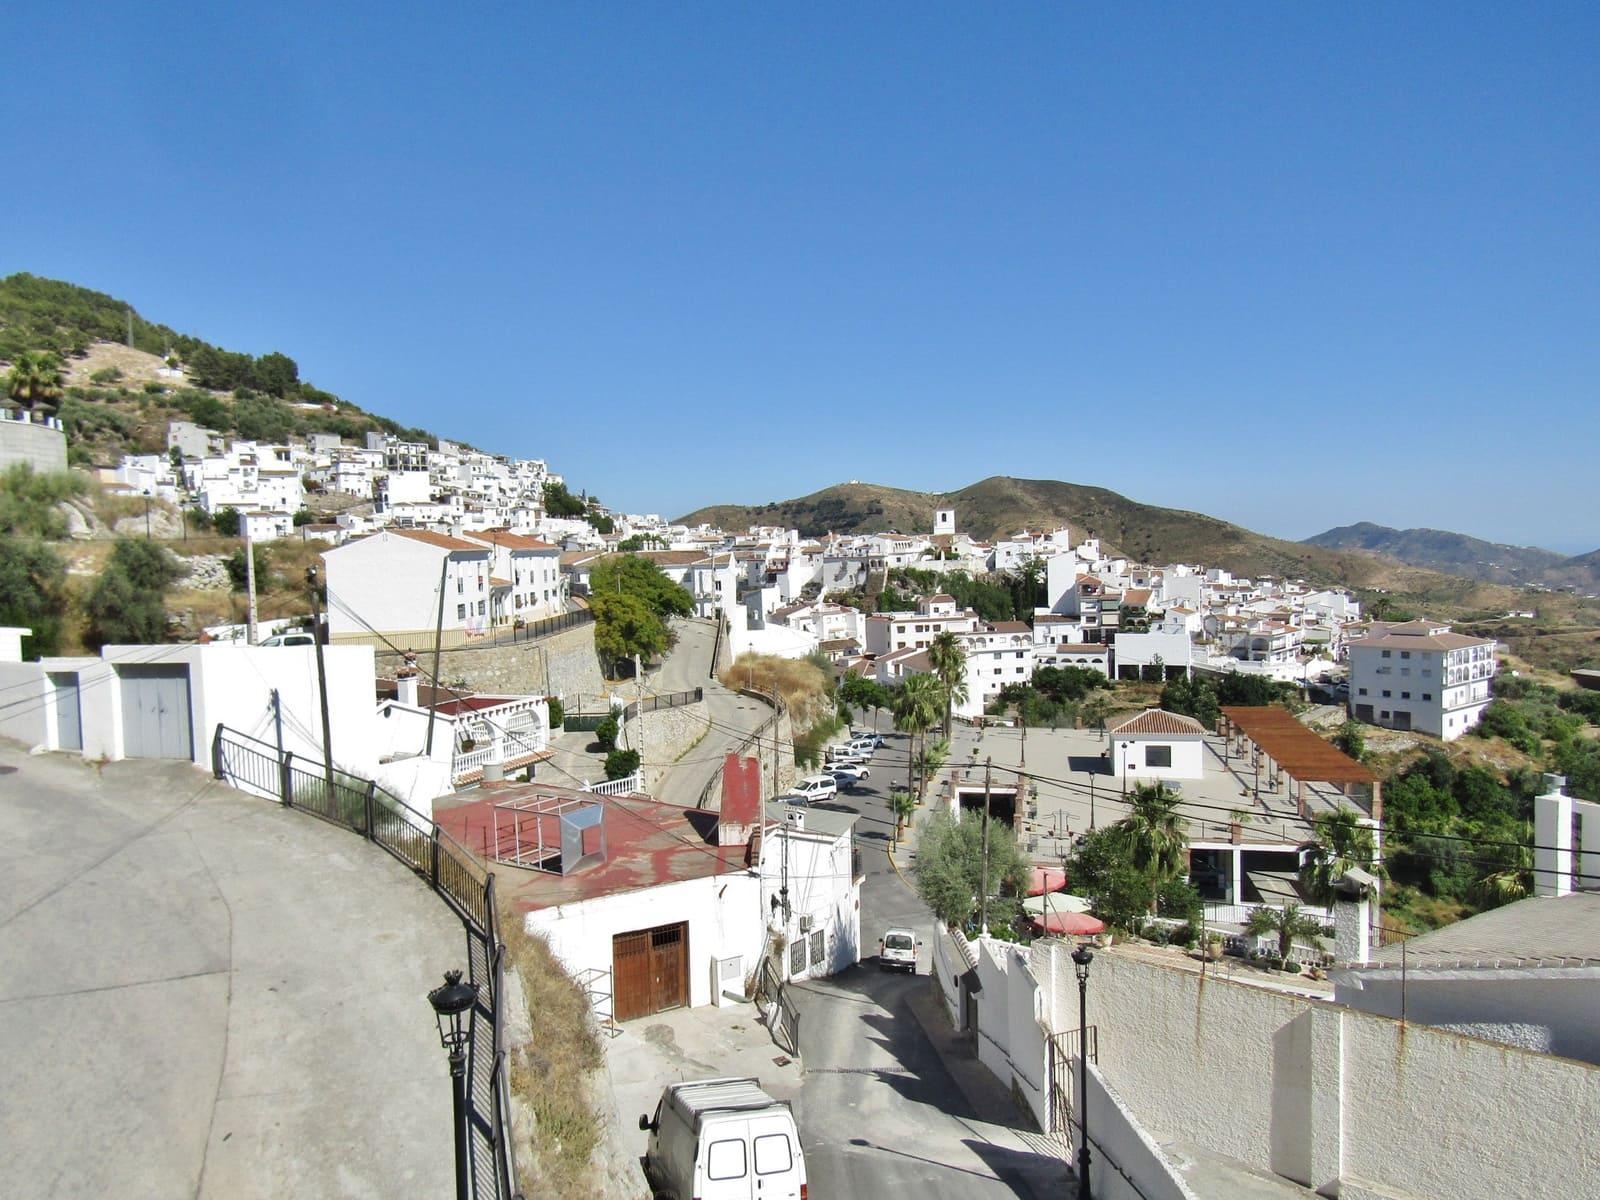 2 bedroom Apartment for sale in Canillas de Aceituno - € 115,000 (Ref: 4680875)